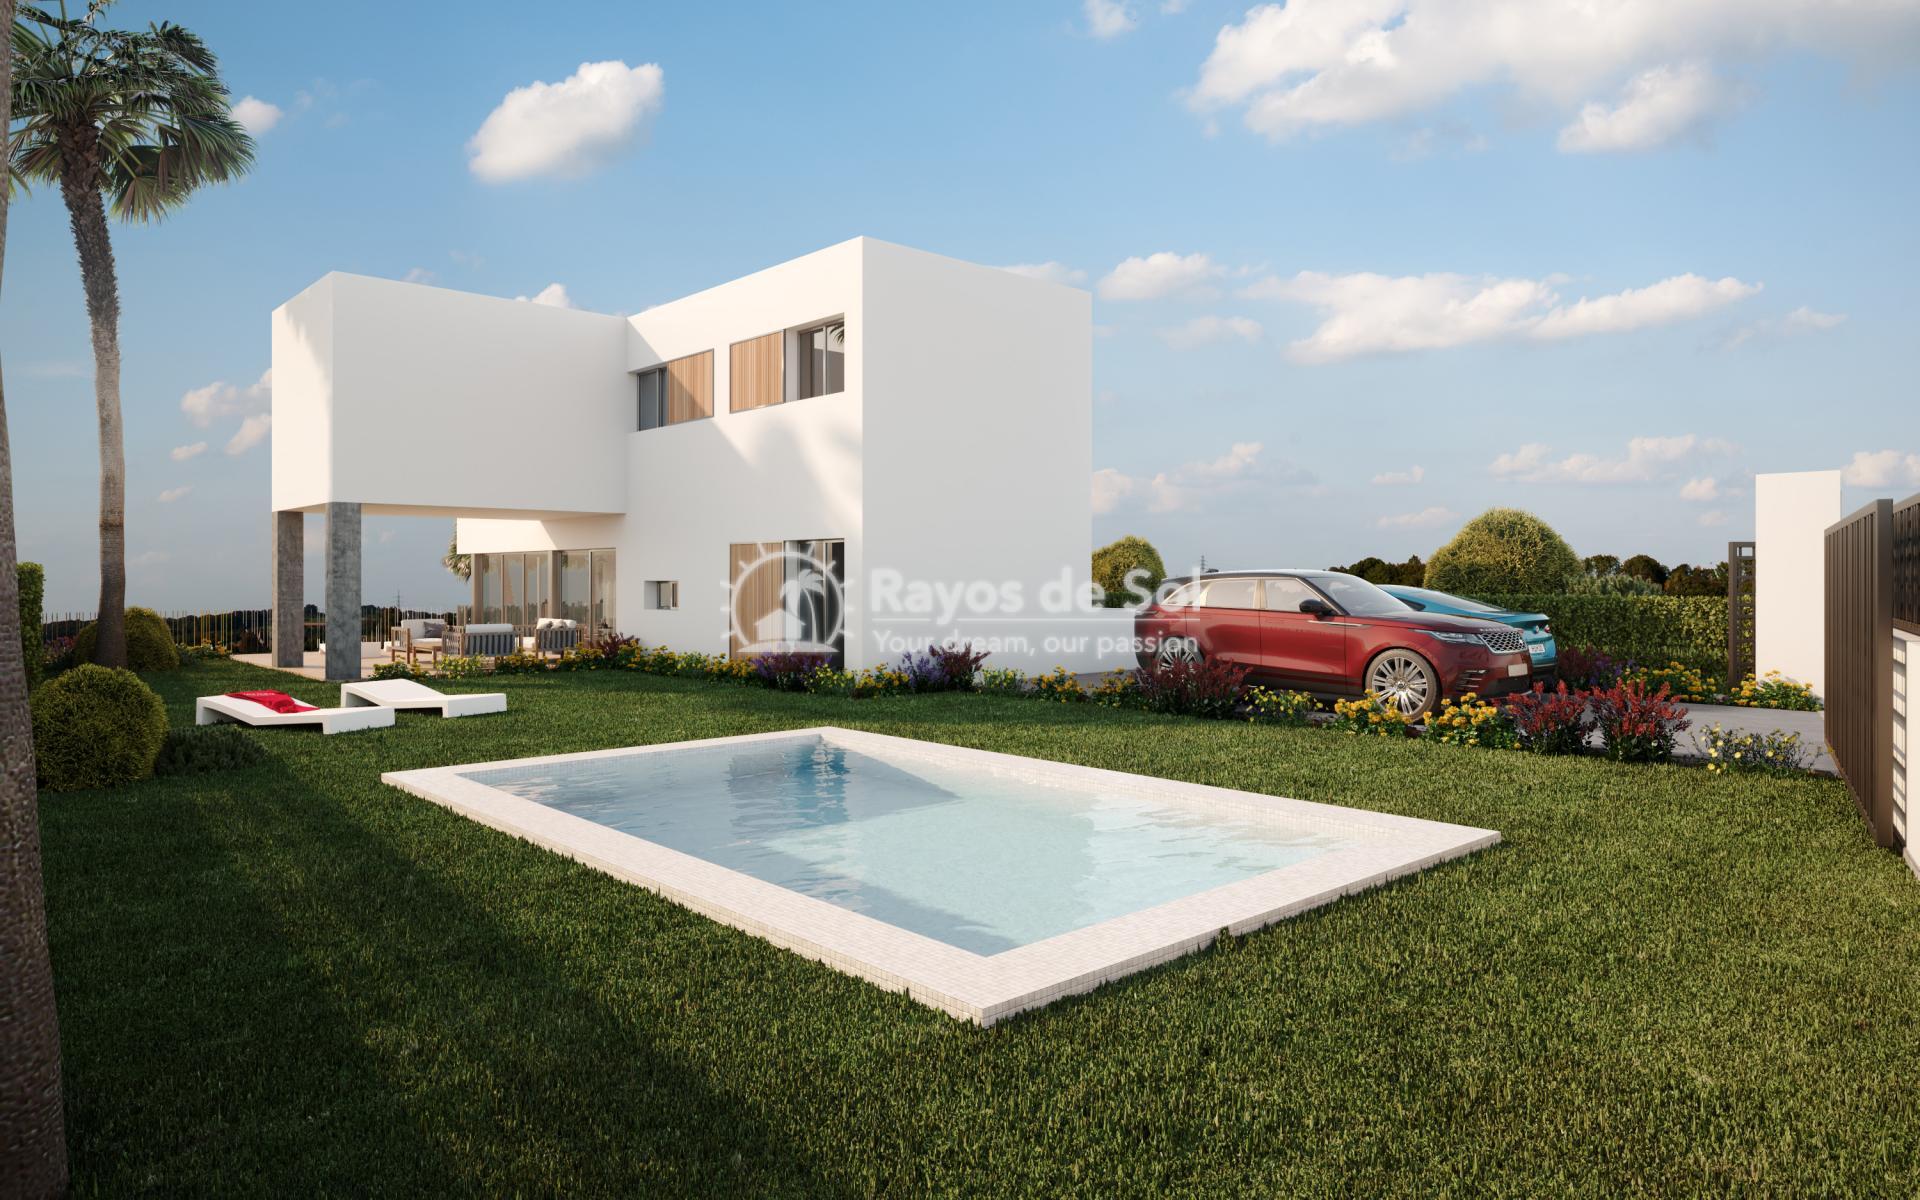 Luxury newbuild villa in La Finca Golf, Algorfa, Costa Blanca (LFPADI) - 5